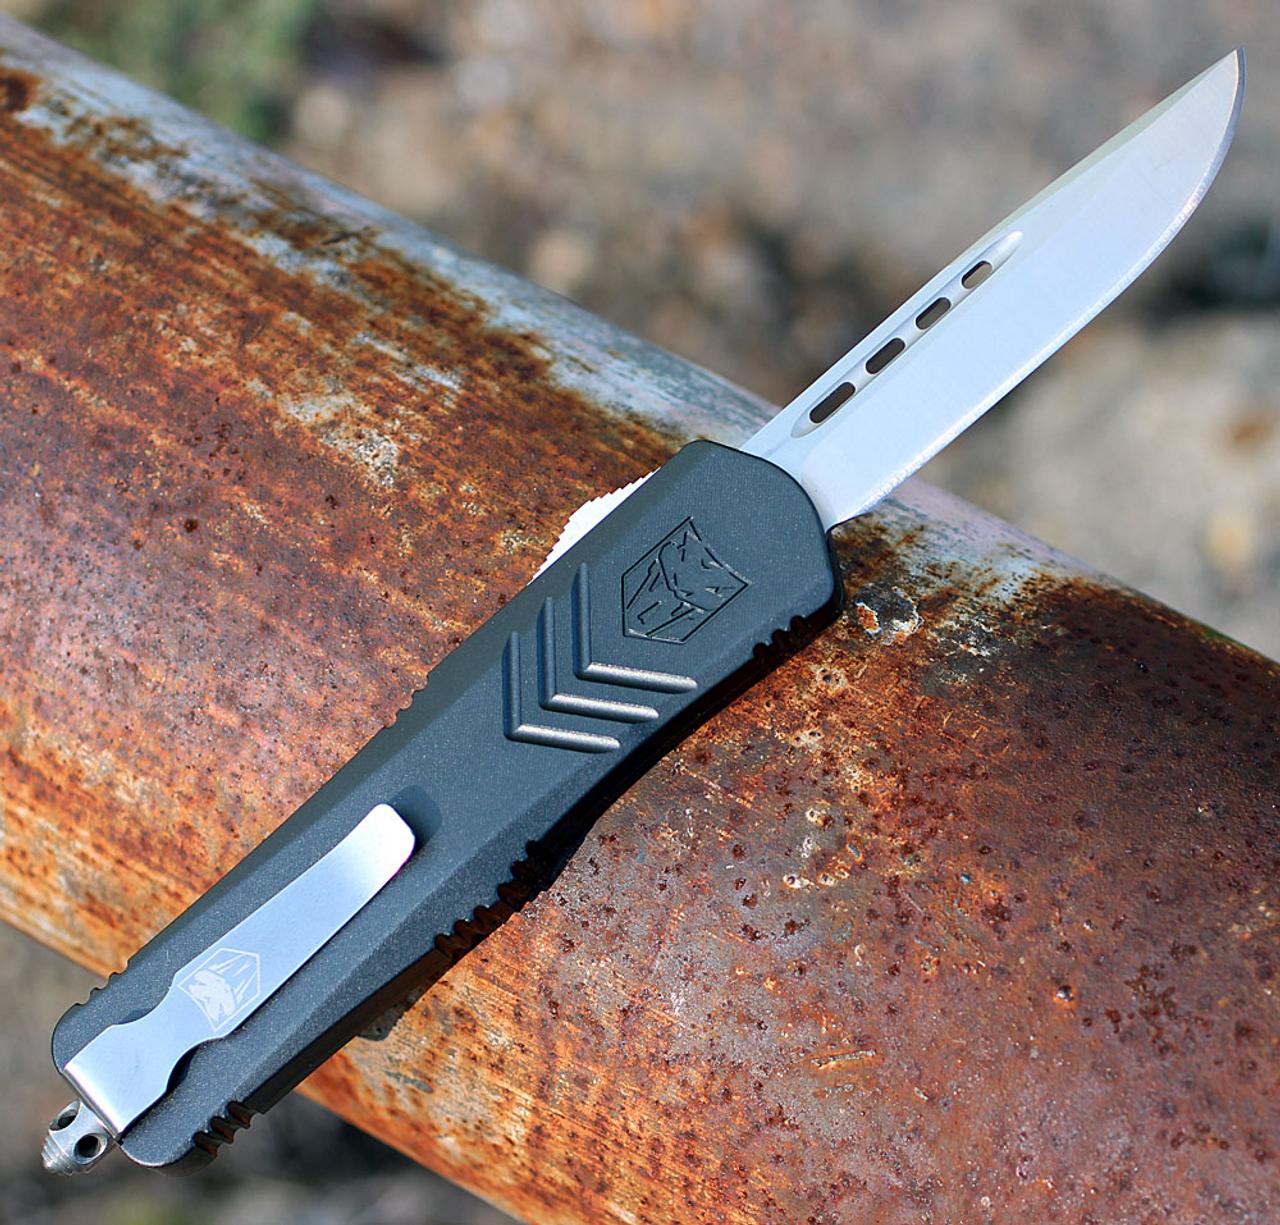 CobraTec Knives MGYFS-XMDNS Medium FS-X Grey, Drop Point Blade, CNC Aviation Aluminum Handle